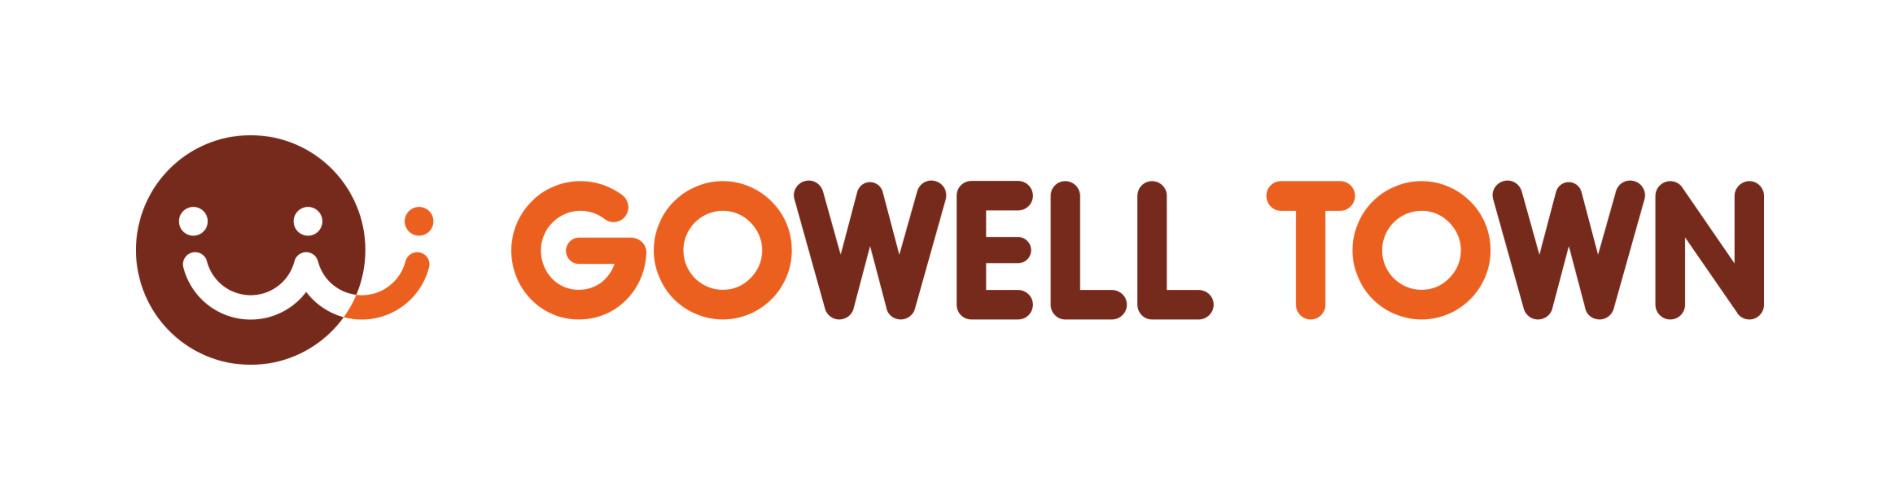 GOWELL TOWN|外国人向け情報タウン